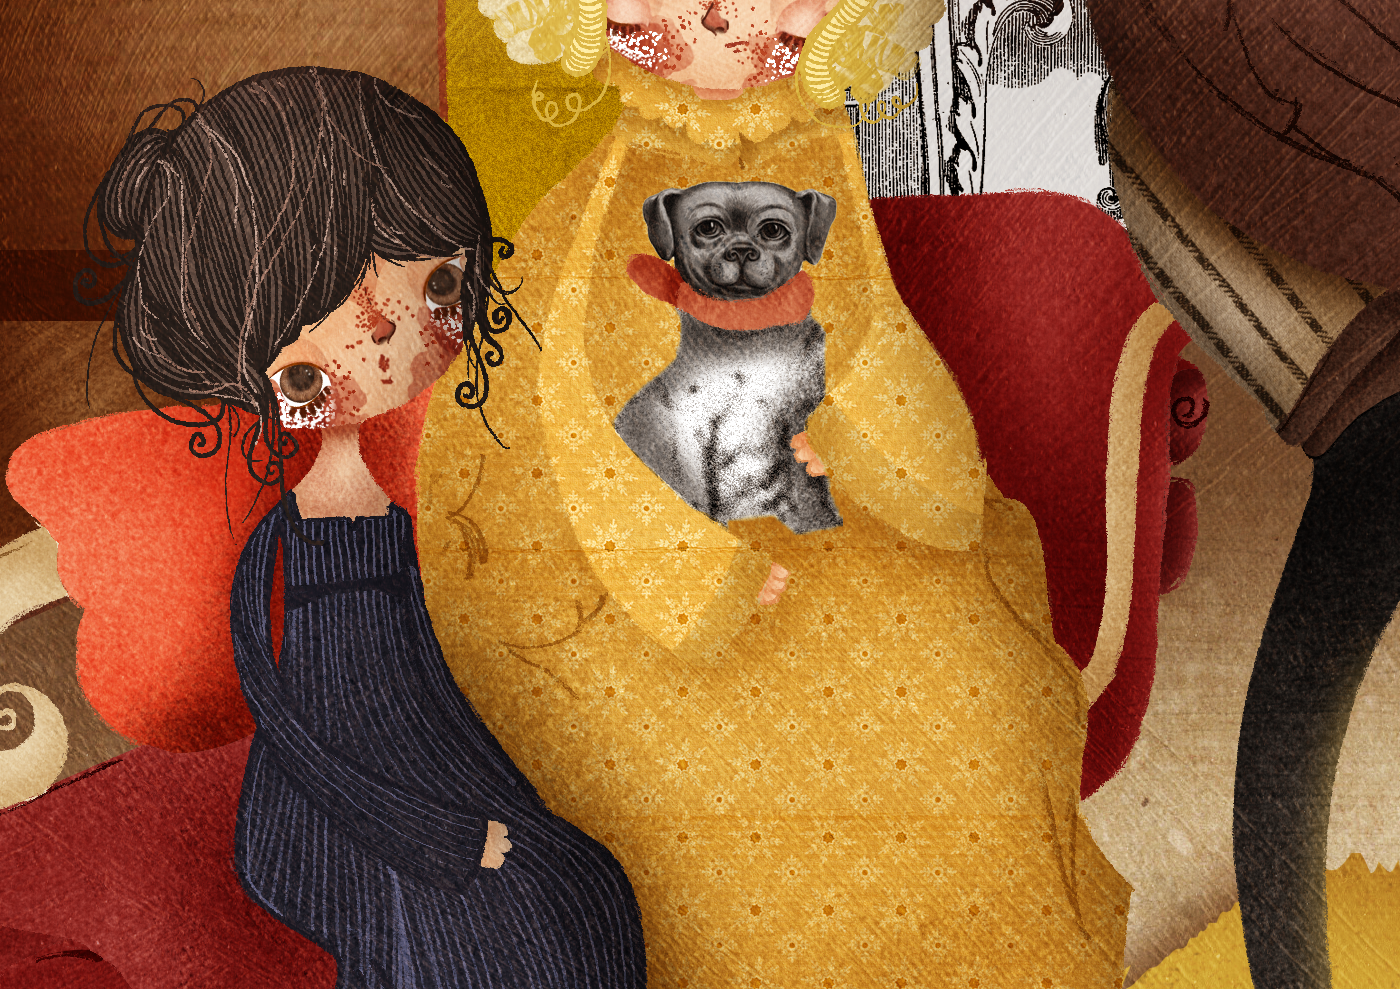 mansfield park jane austen Fanny Price arte digital book ILLUSTRATION  Ilustração lizzie bennet Orgulho e Preconceito Pride and Prejudice